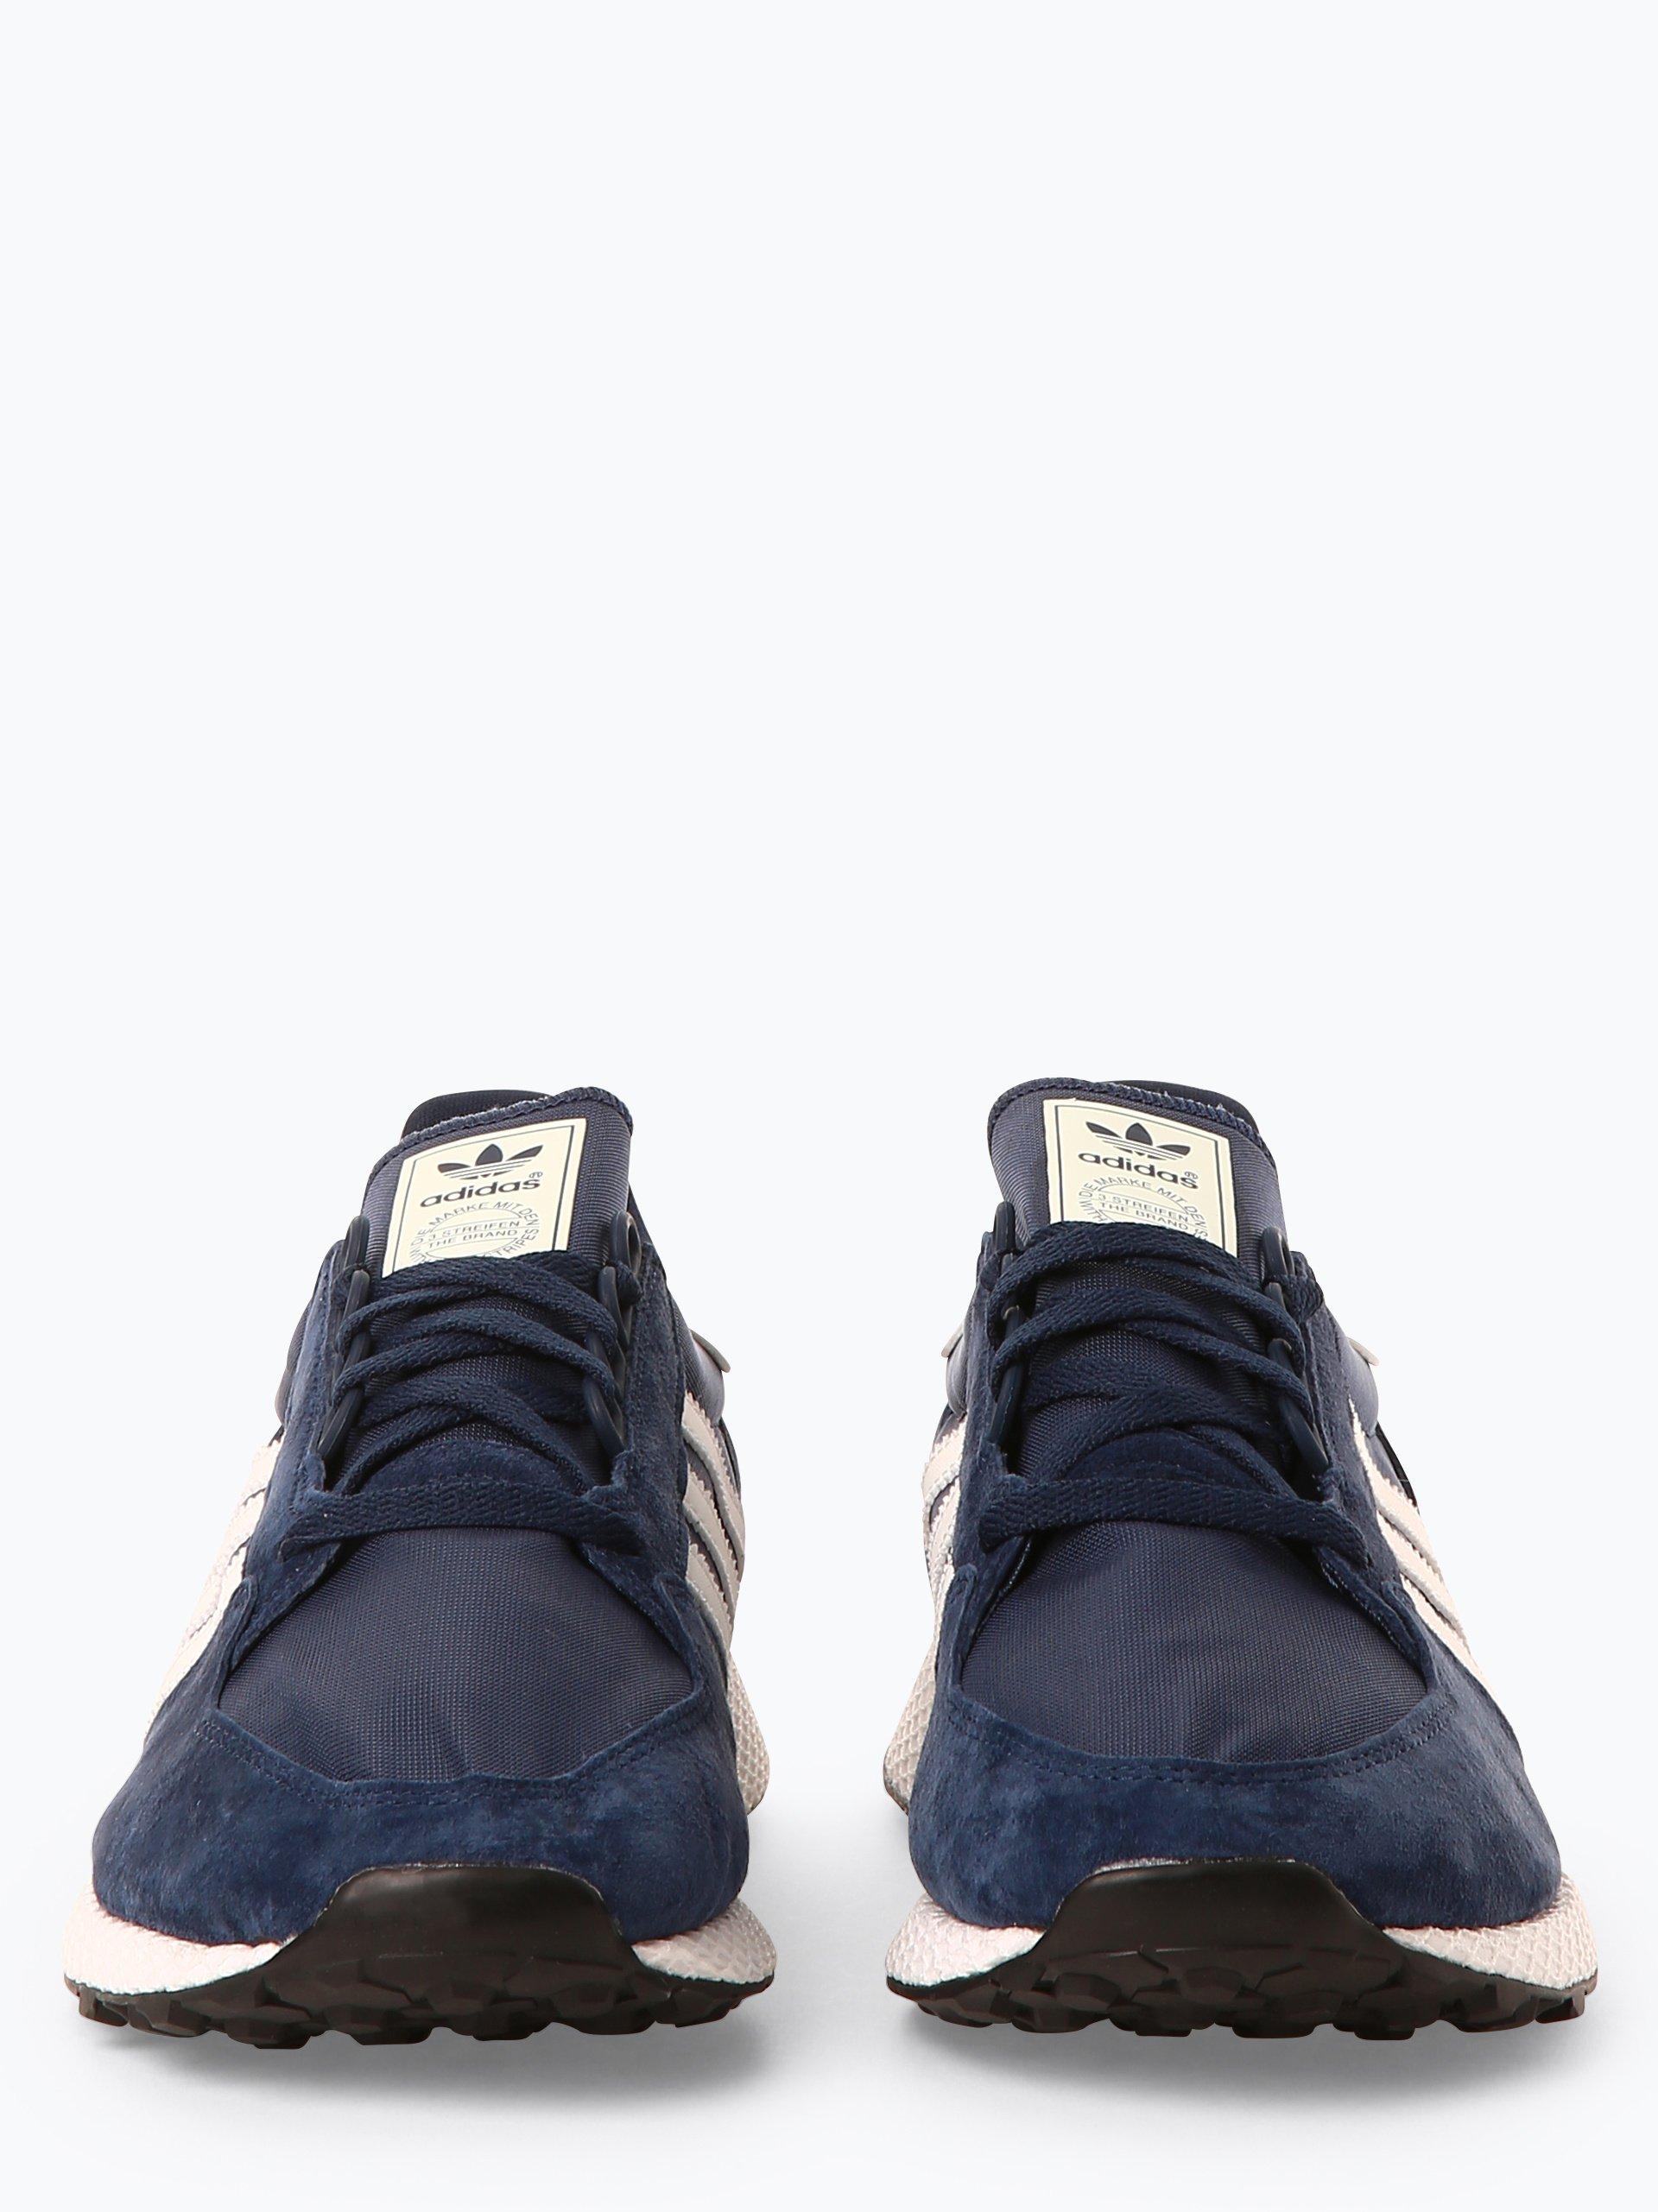 adidas Originals Tenisówki męskie – Forest Grove